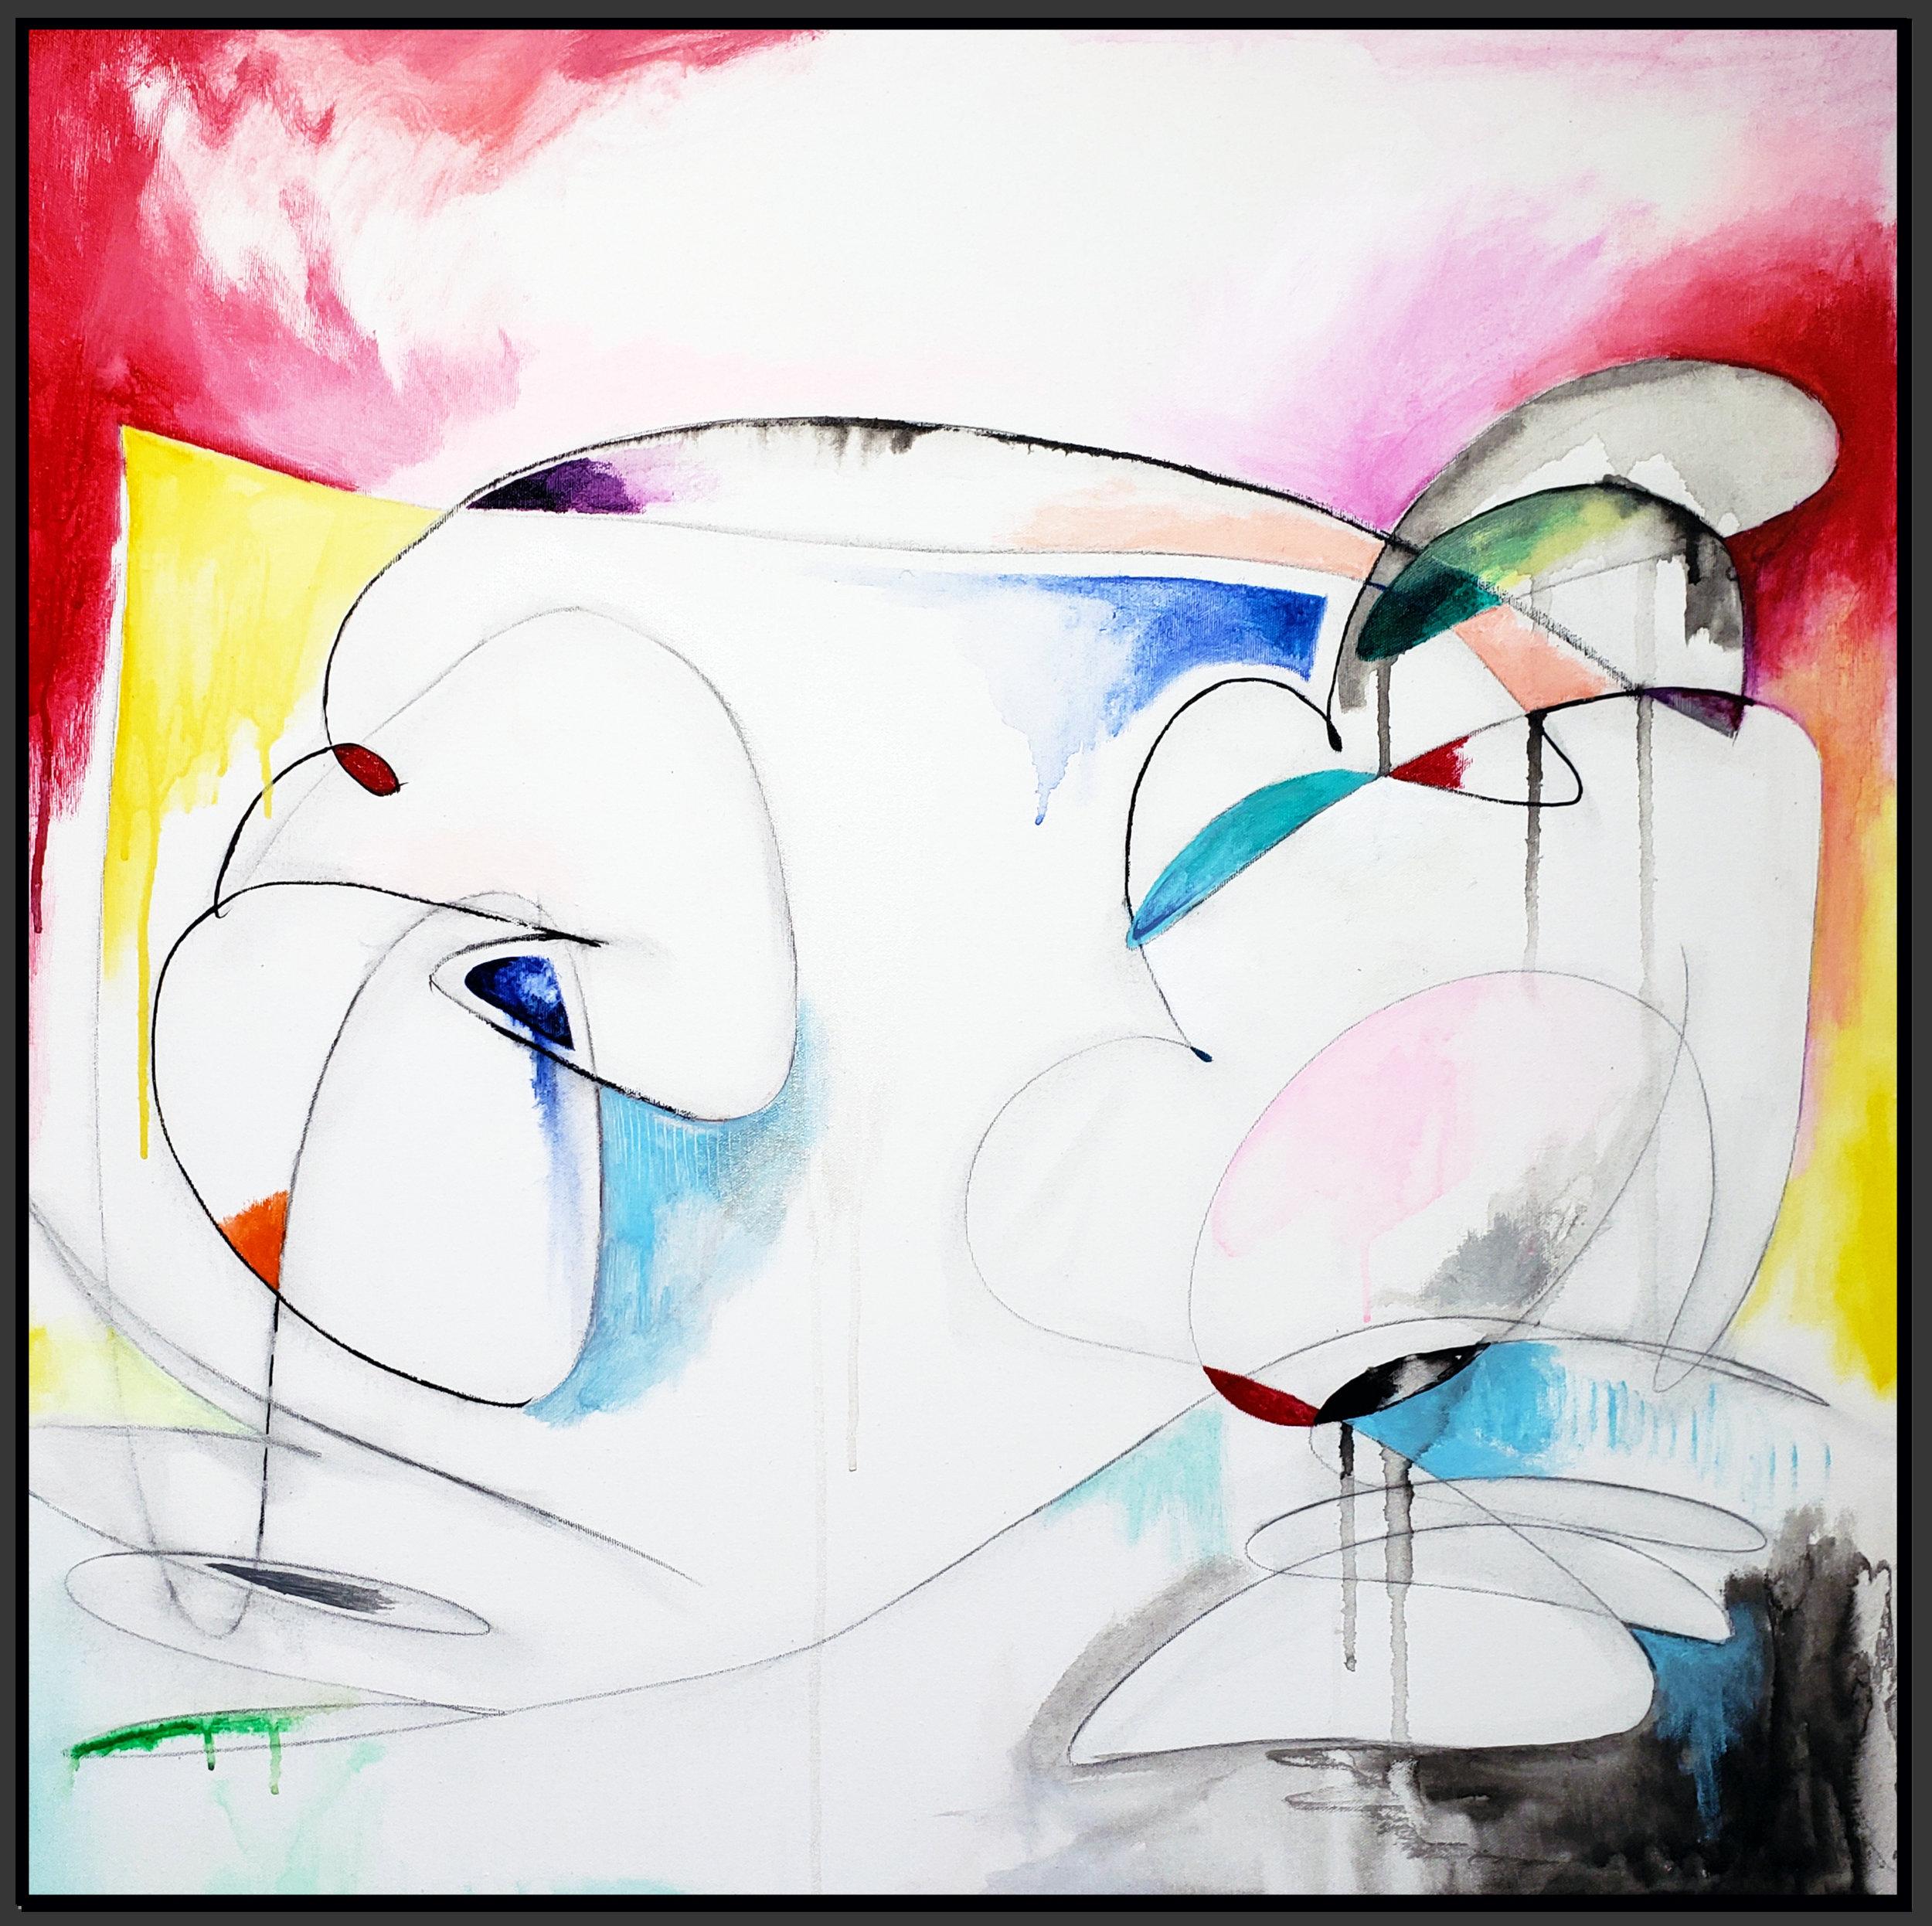 "Untitled#100, 2019, acrylic on canvas, 30"" x 30"" (76 x 76 cm)"